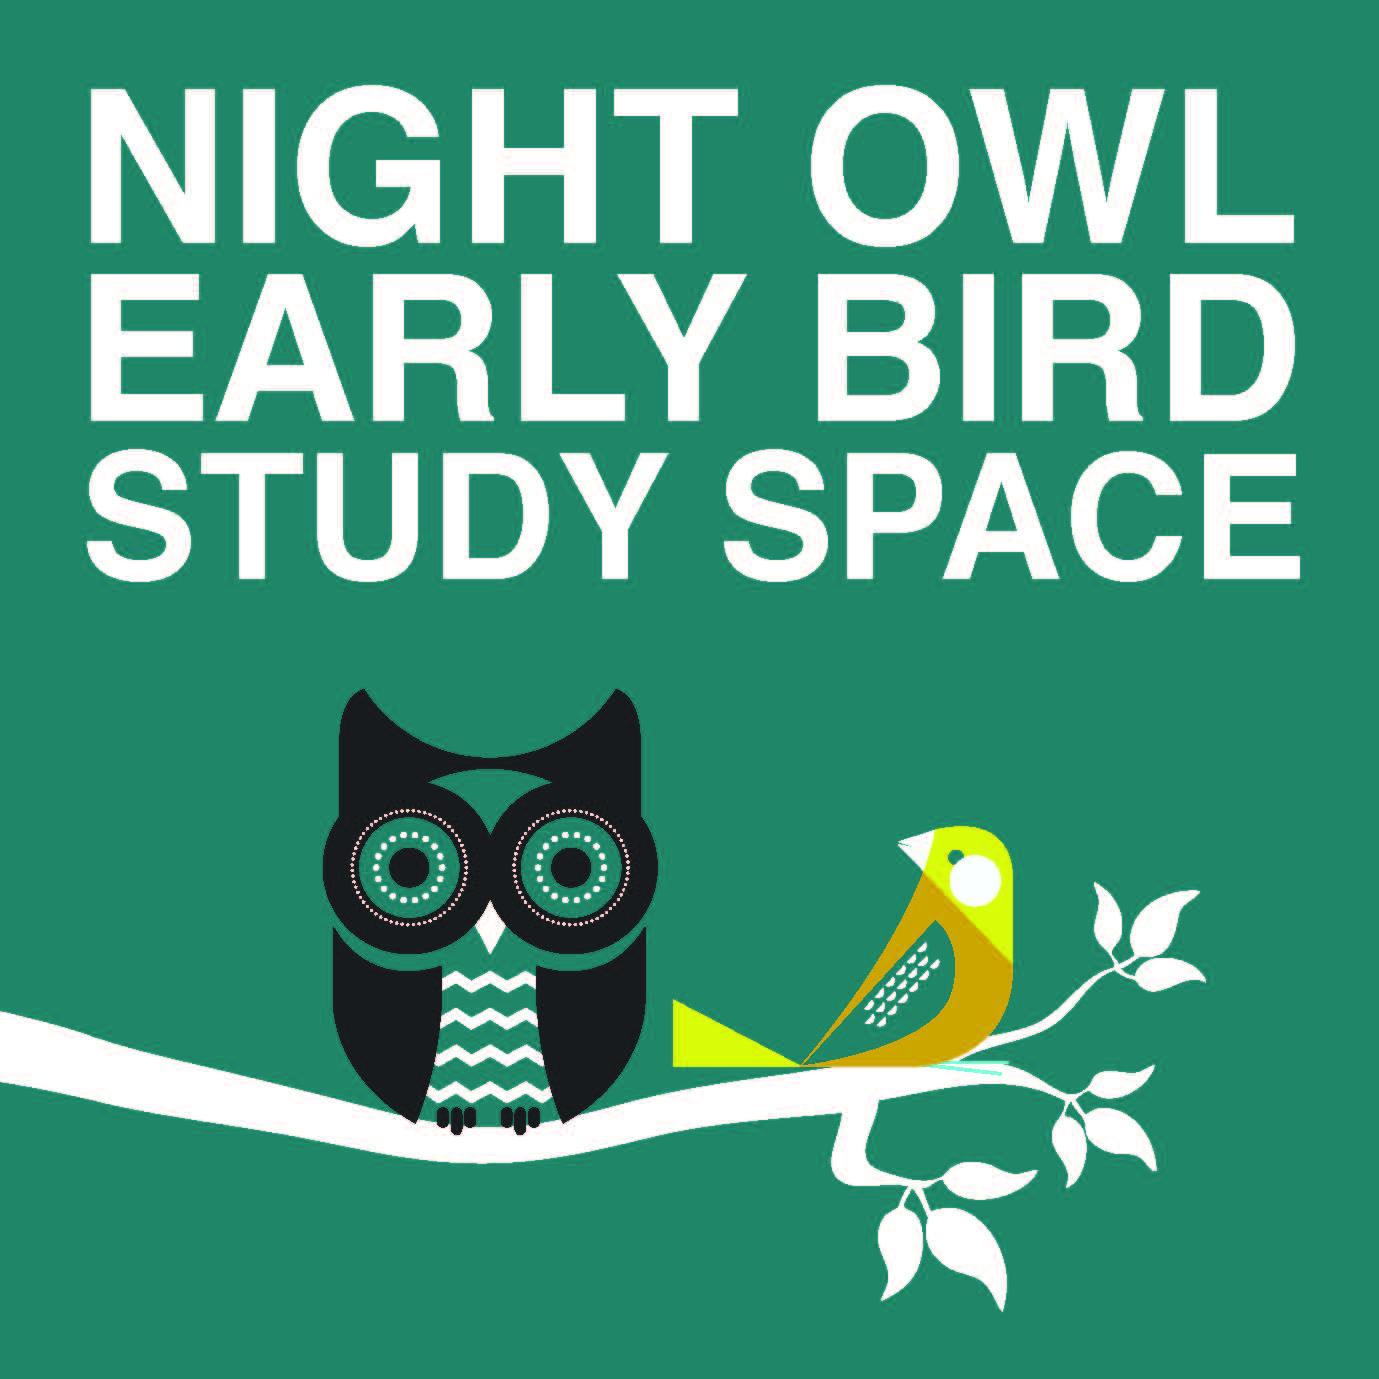 Early bird vs night owl essays